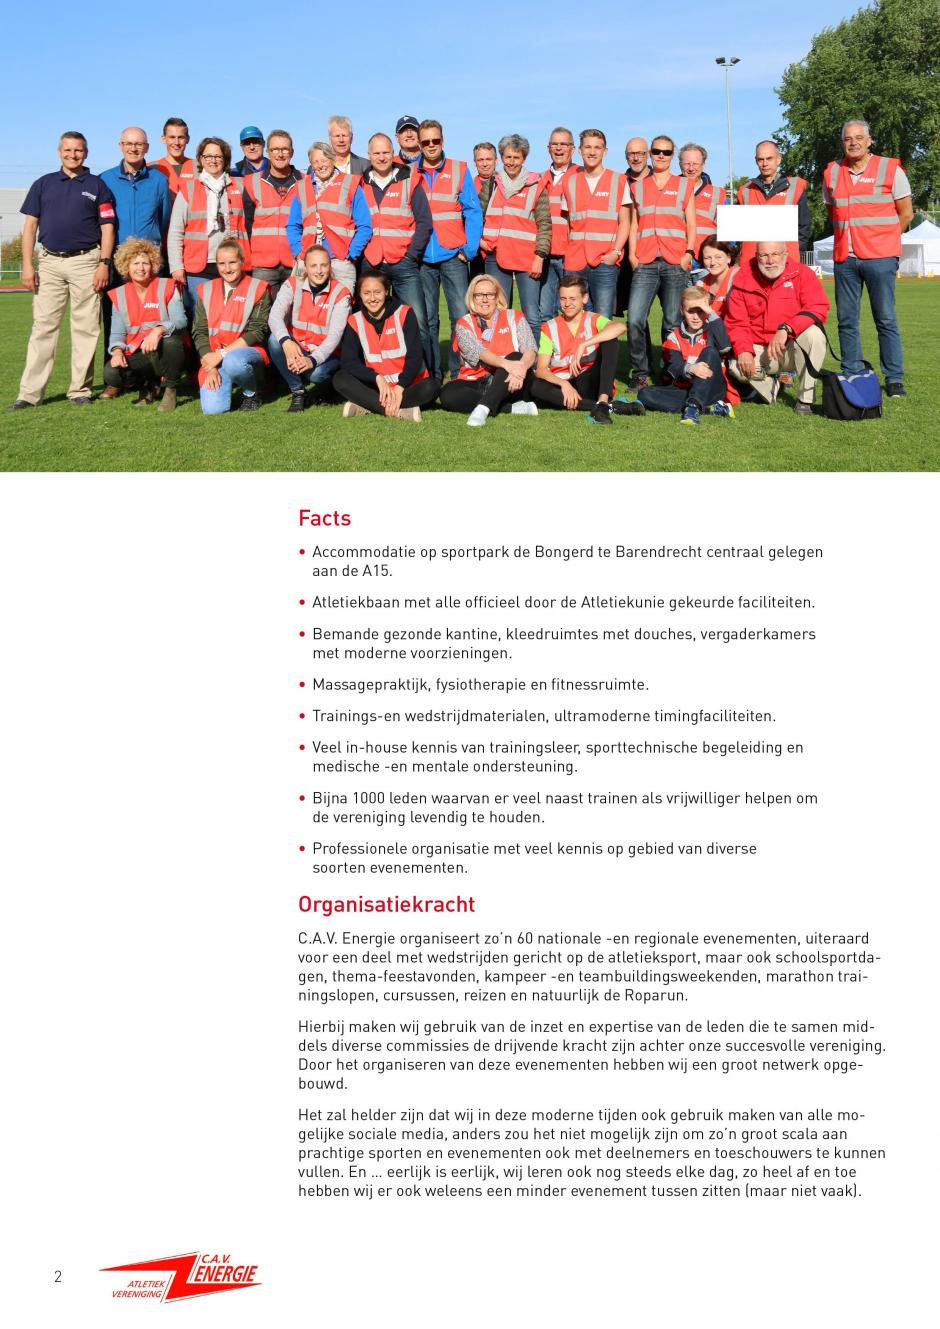 sponsoren_en_samenwerken_pagina_2_2.jpg